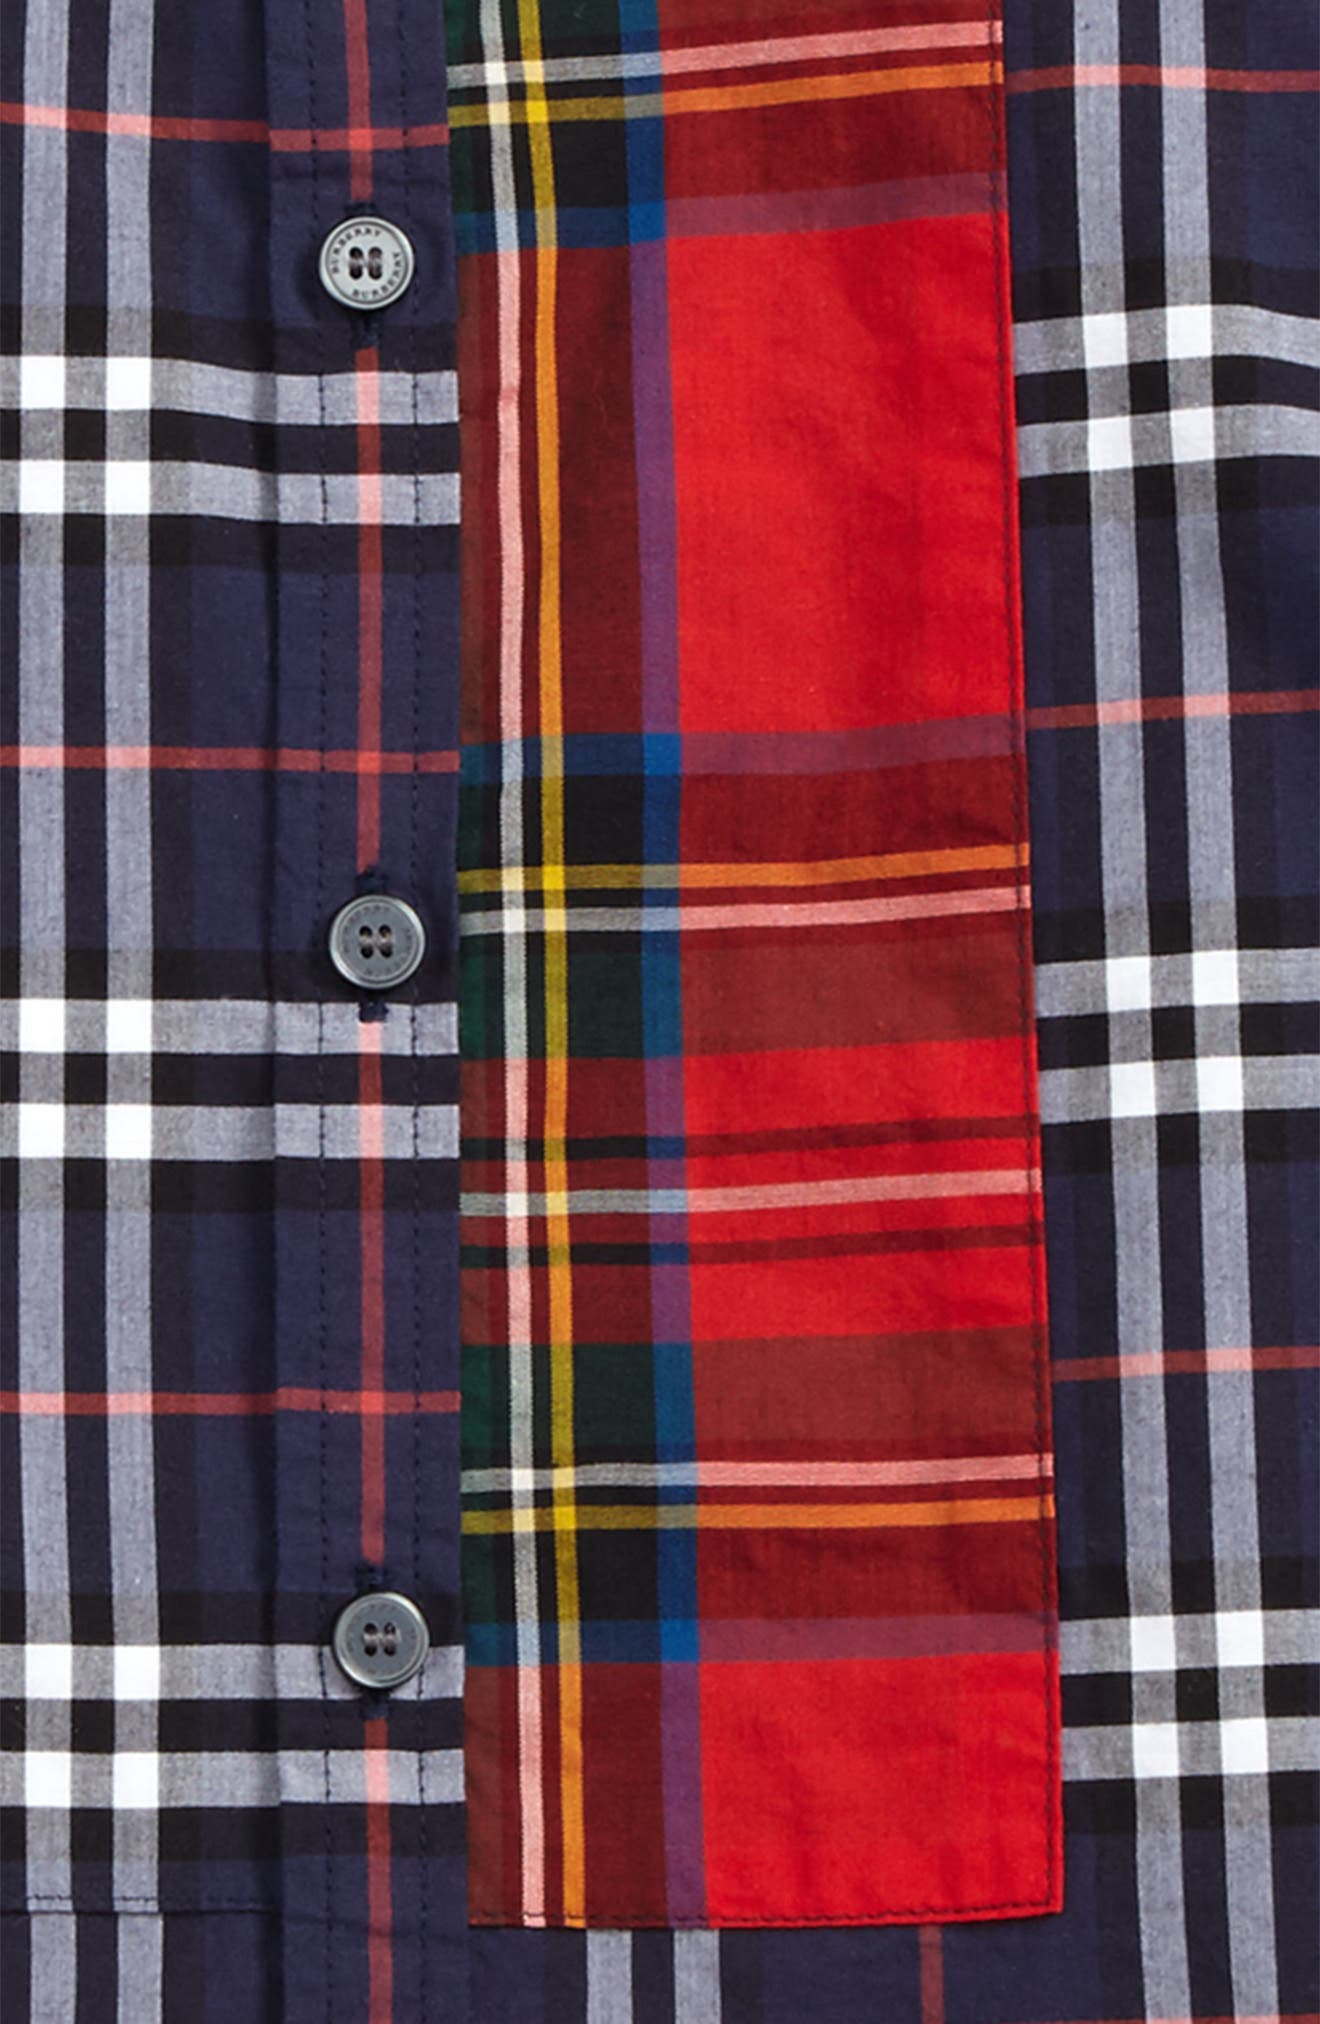 Alternate Image 2  - Burberry Argus Check Print Woven Shirt (Toddler Boys, Little Boys & Big Boys)